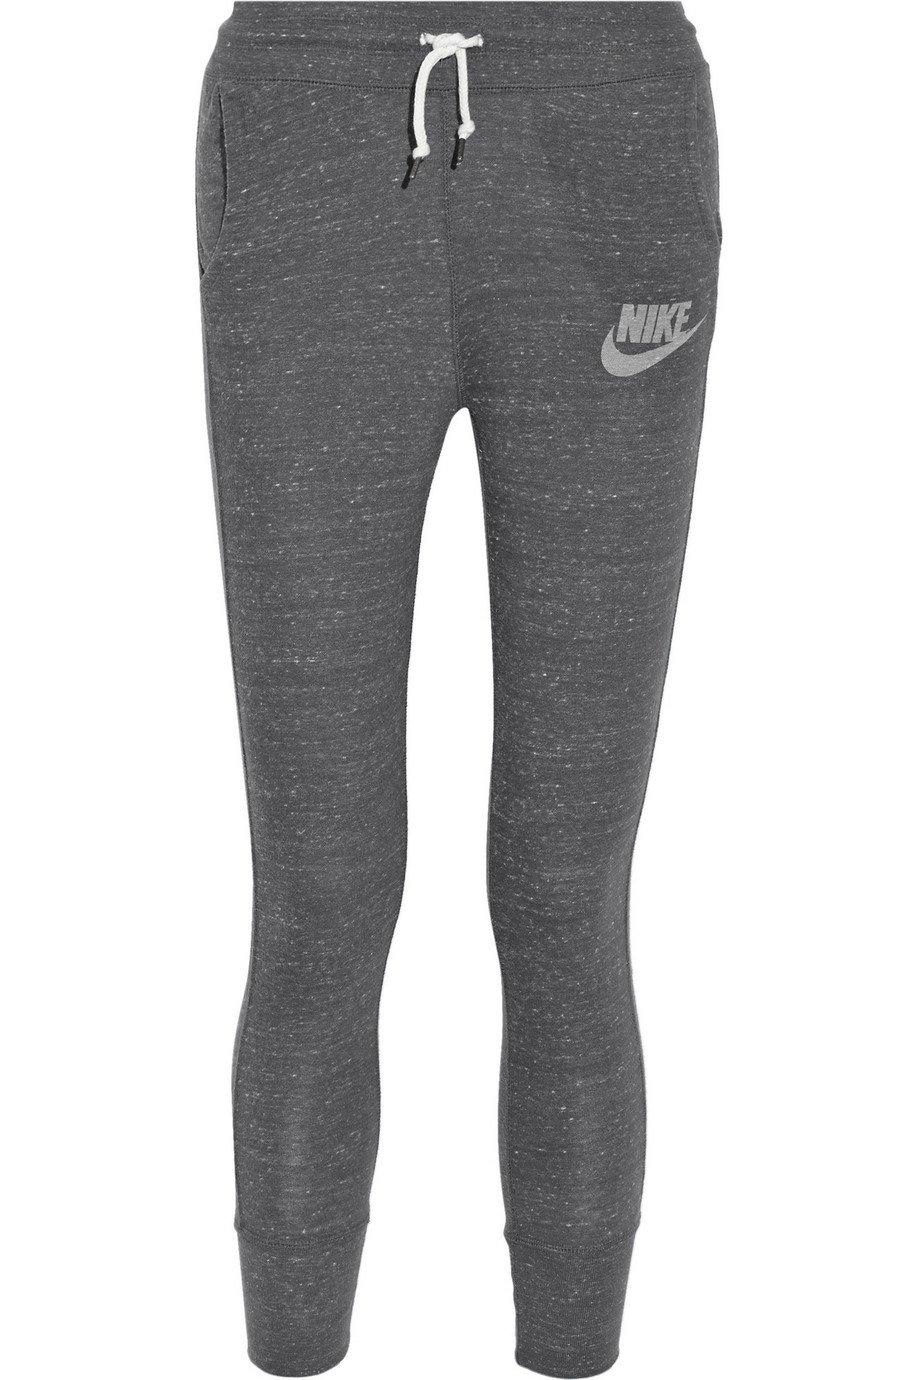 Nike | Gym Vintage organic cotton-blend jersey track pants | NET-A-PORTER.COM